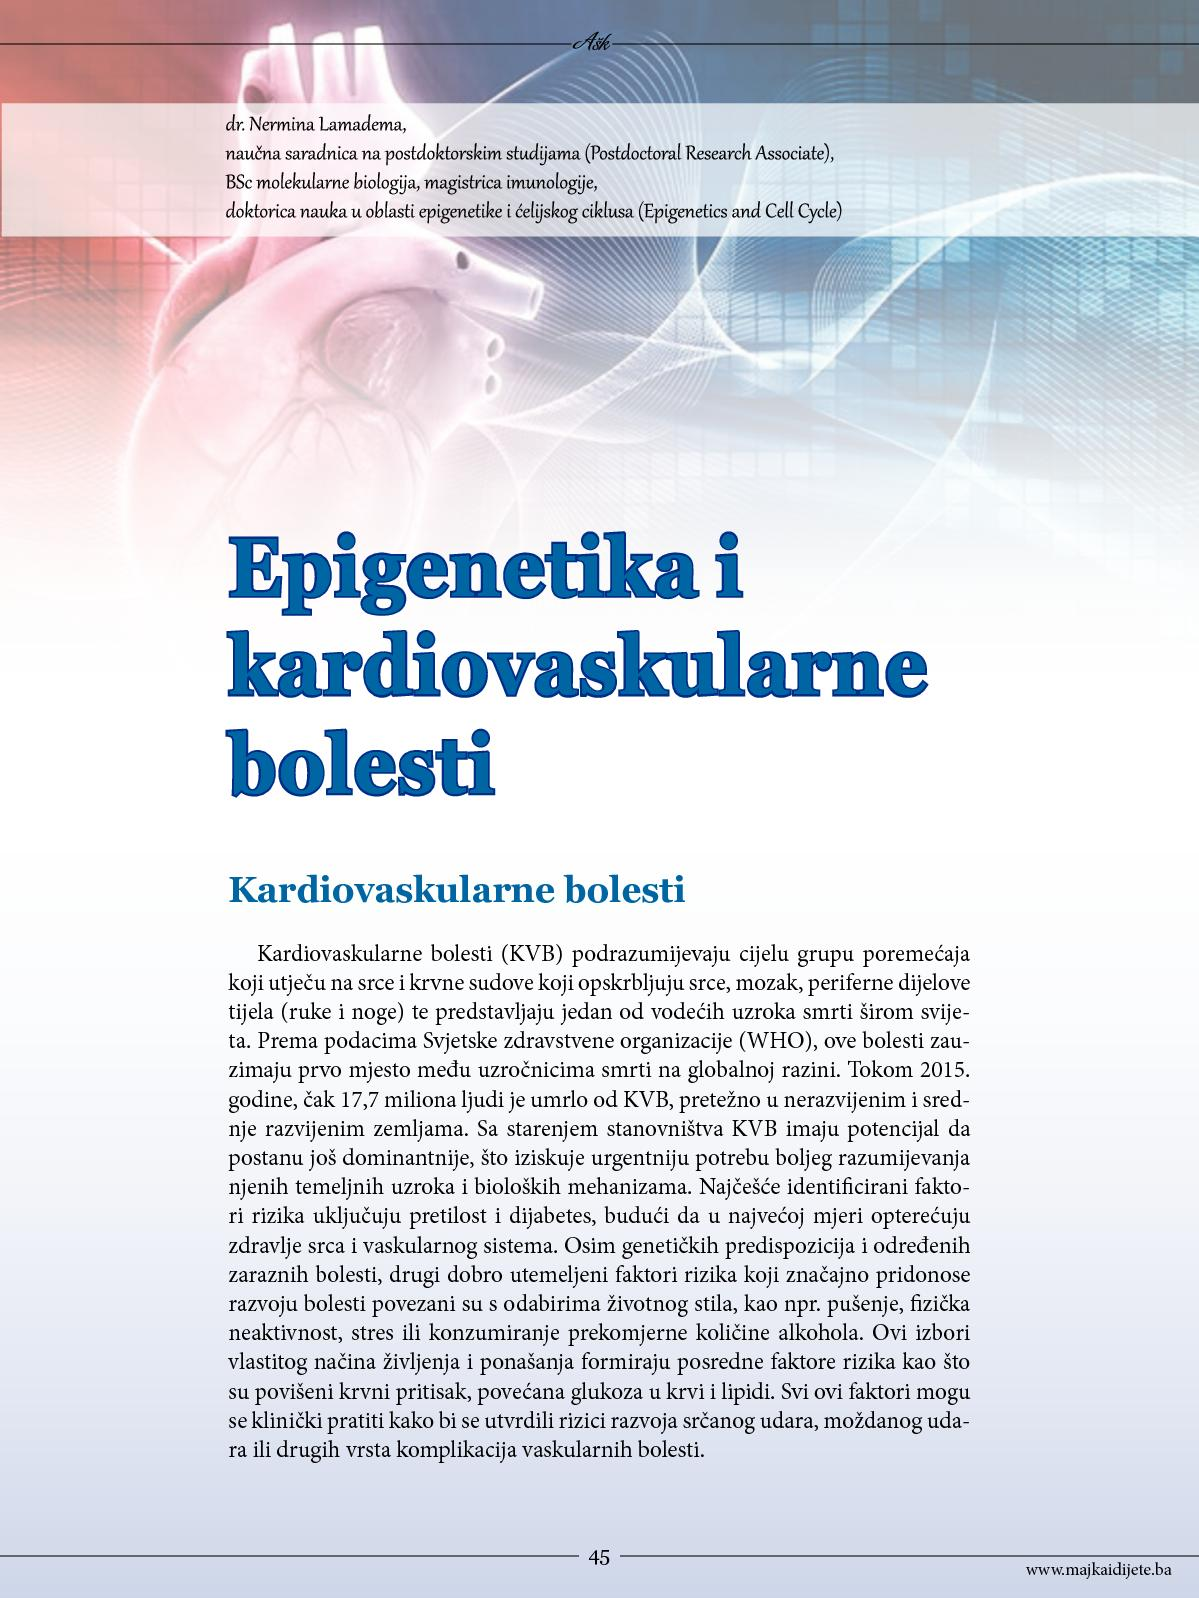 Kardiovaskularne bolesti | Hrvatski zavod za javno zdravstvo